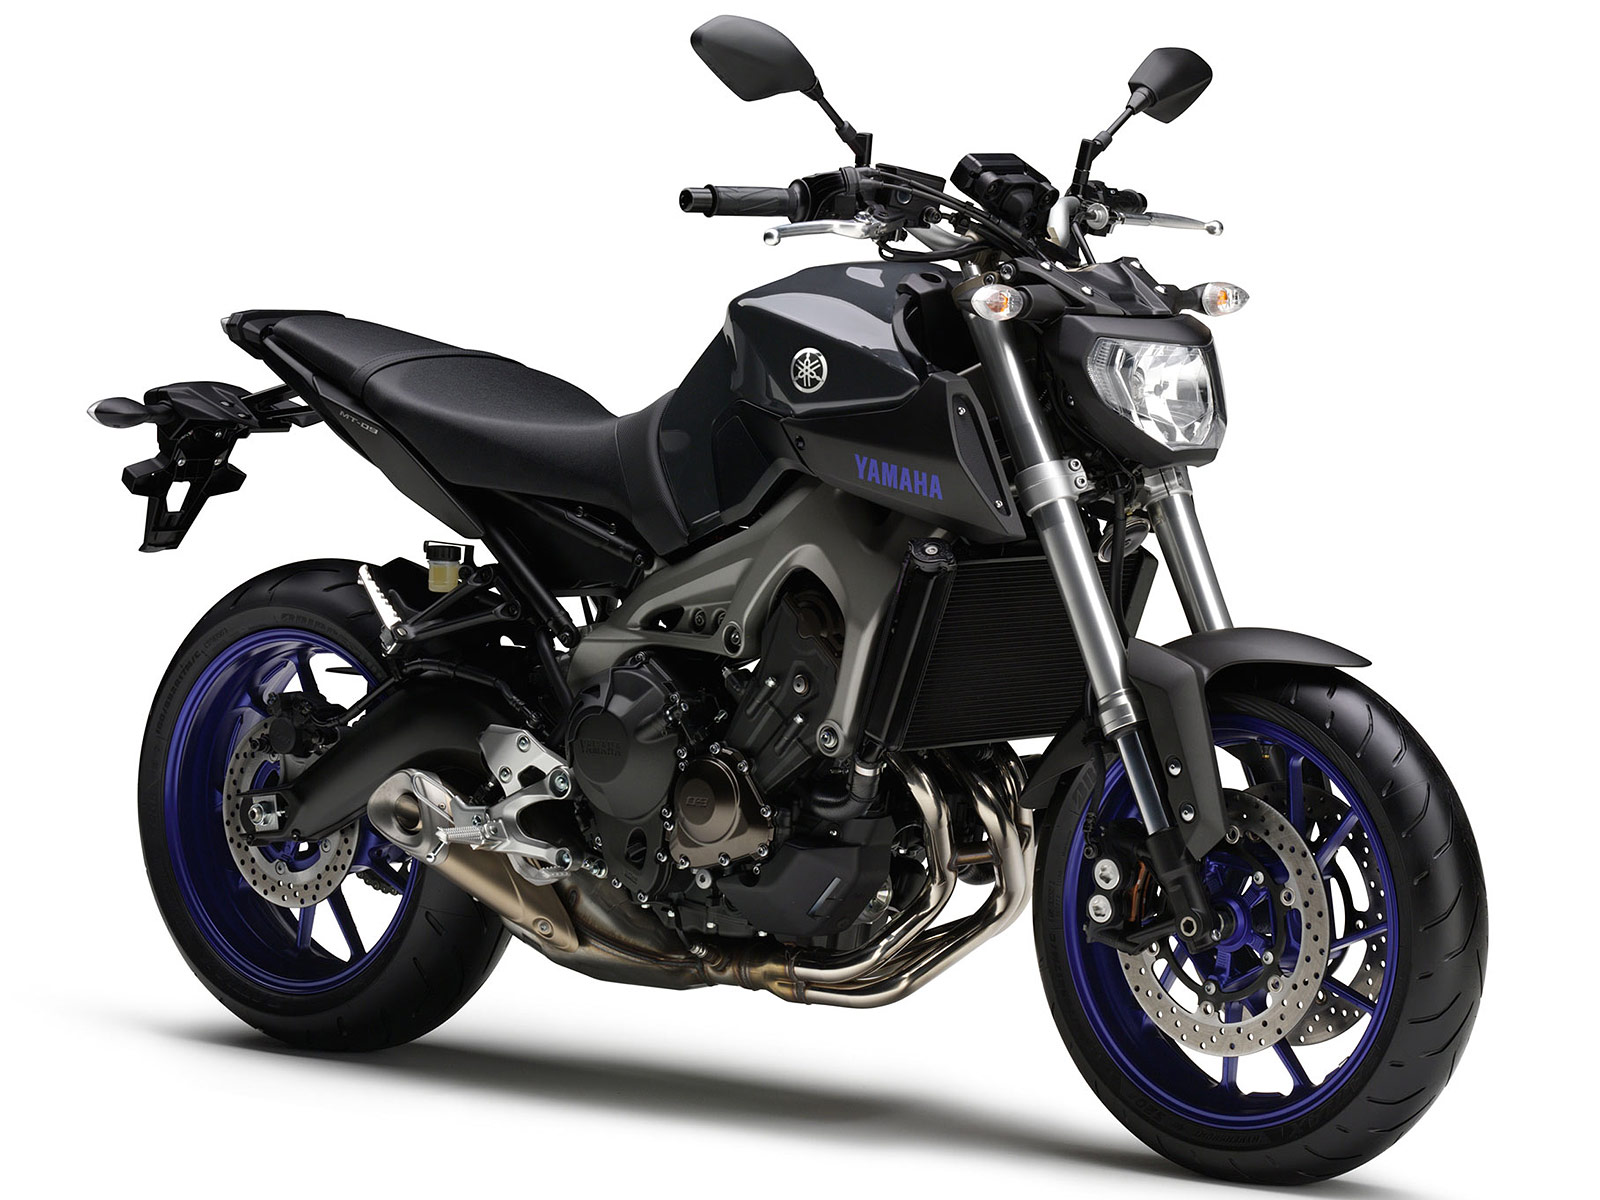 2014-Yamaha-FZ-09-WING8225 - Motorcycle.com